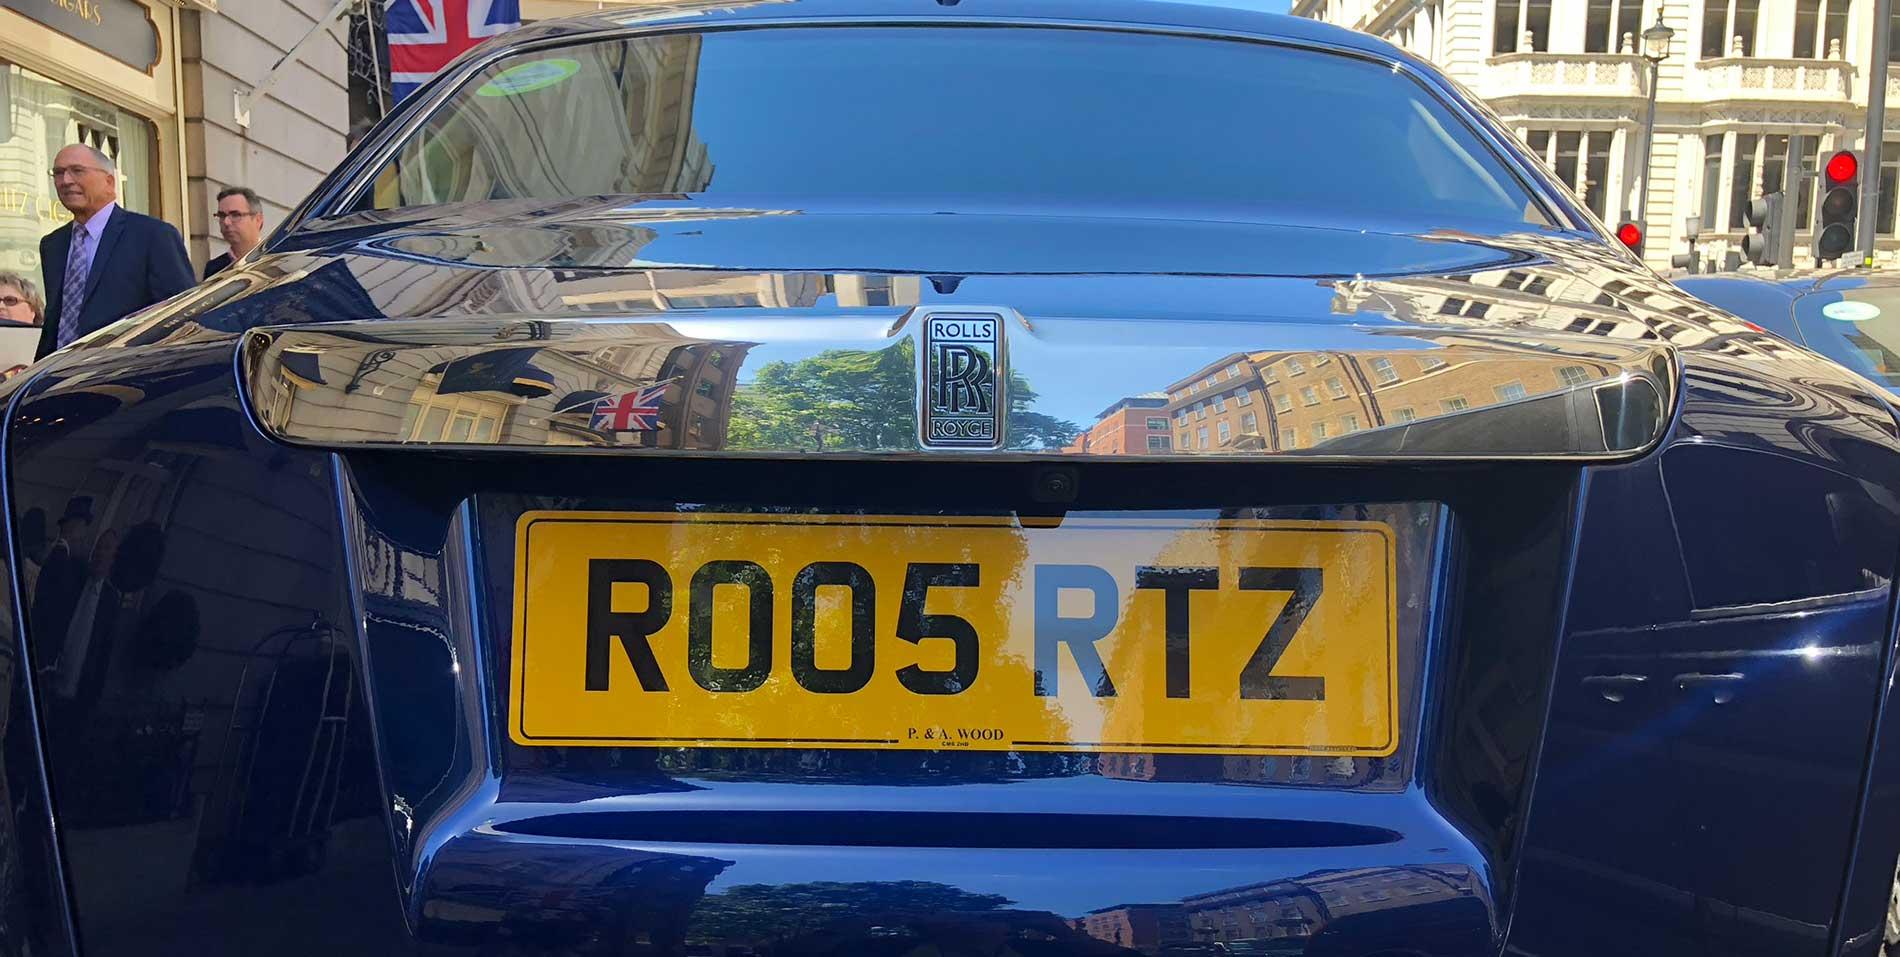 Ritz Rolls-Royce